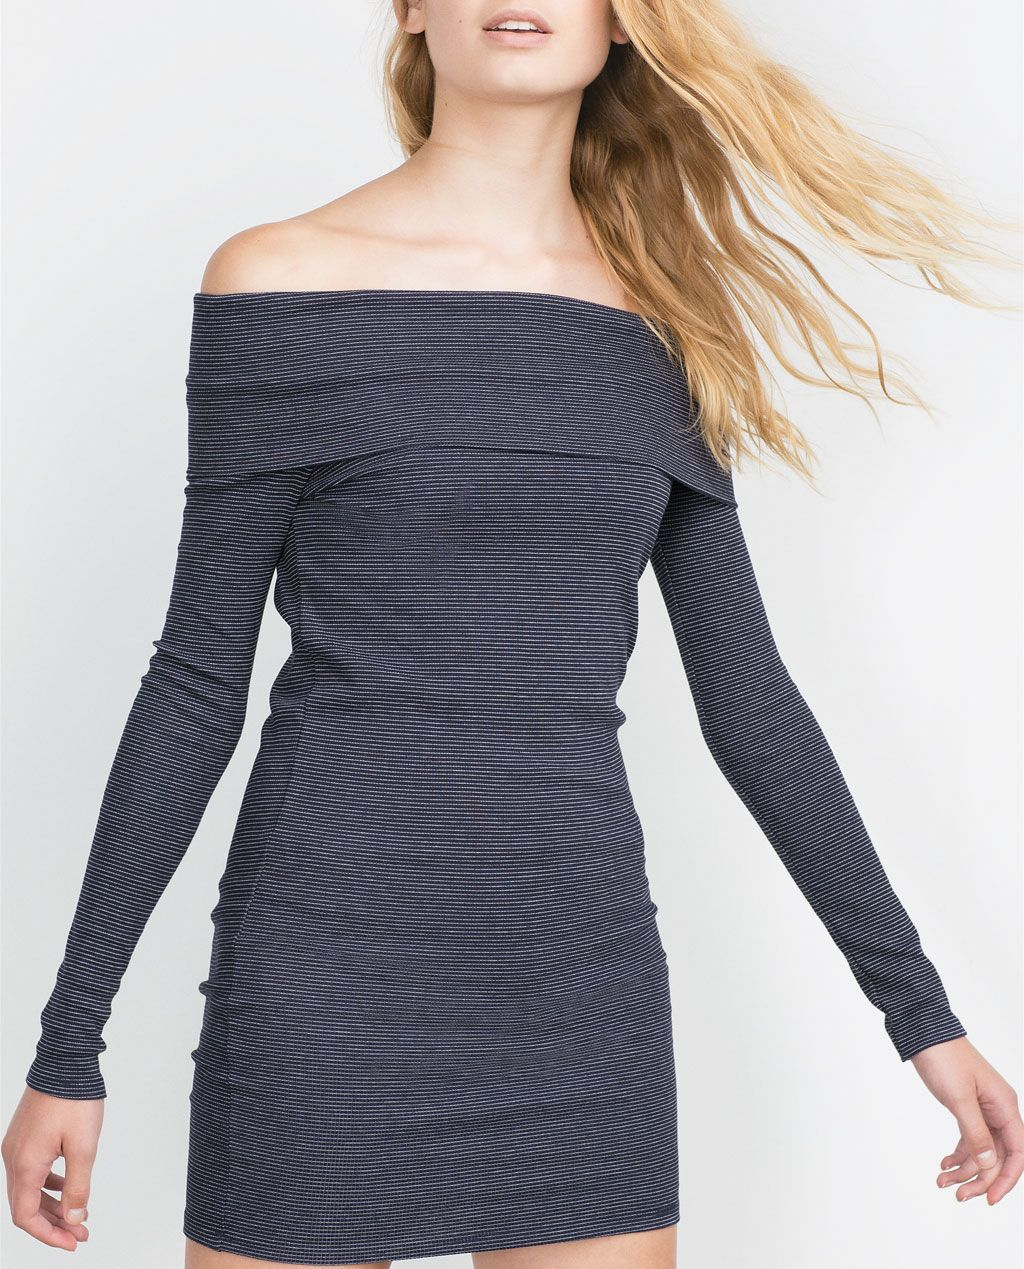 ZARA - WOMAN - BOAT NECK PRINTED DRESS   late summer, early fall ...